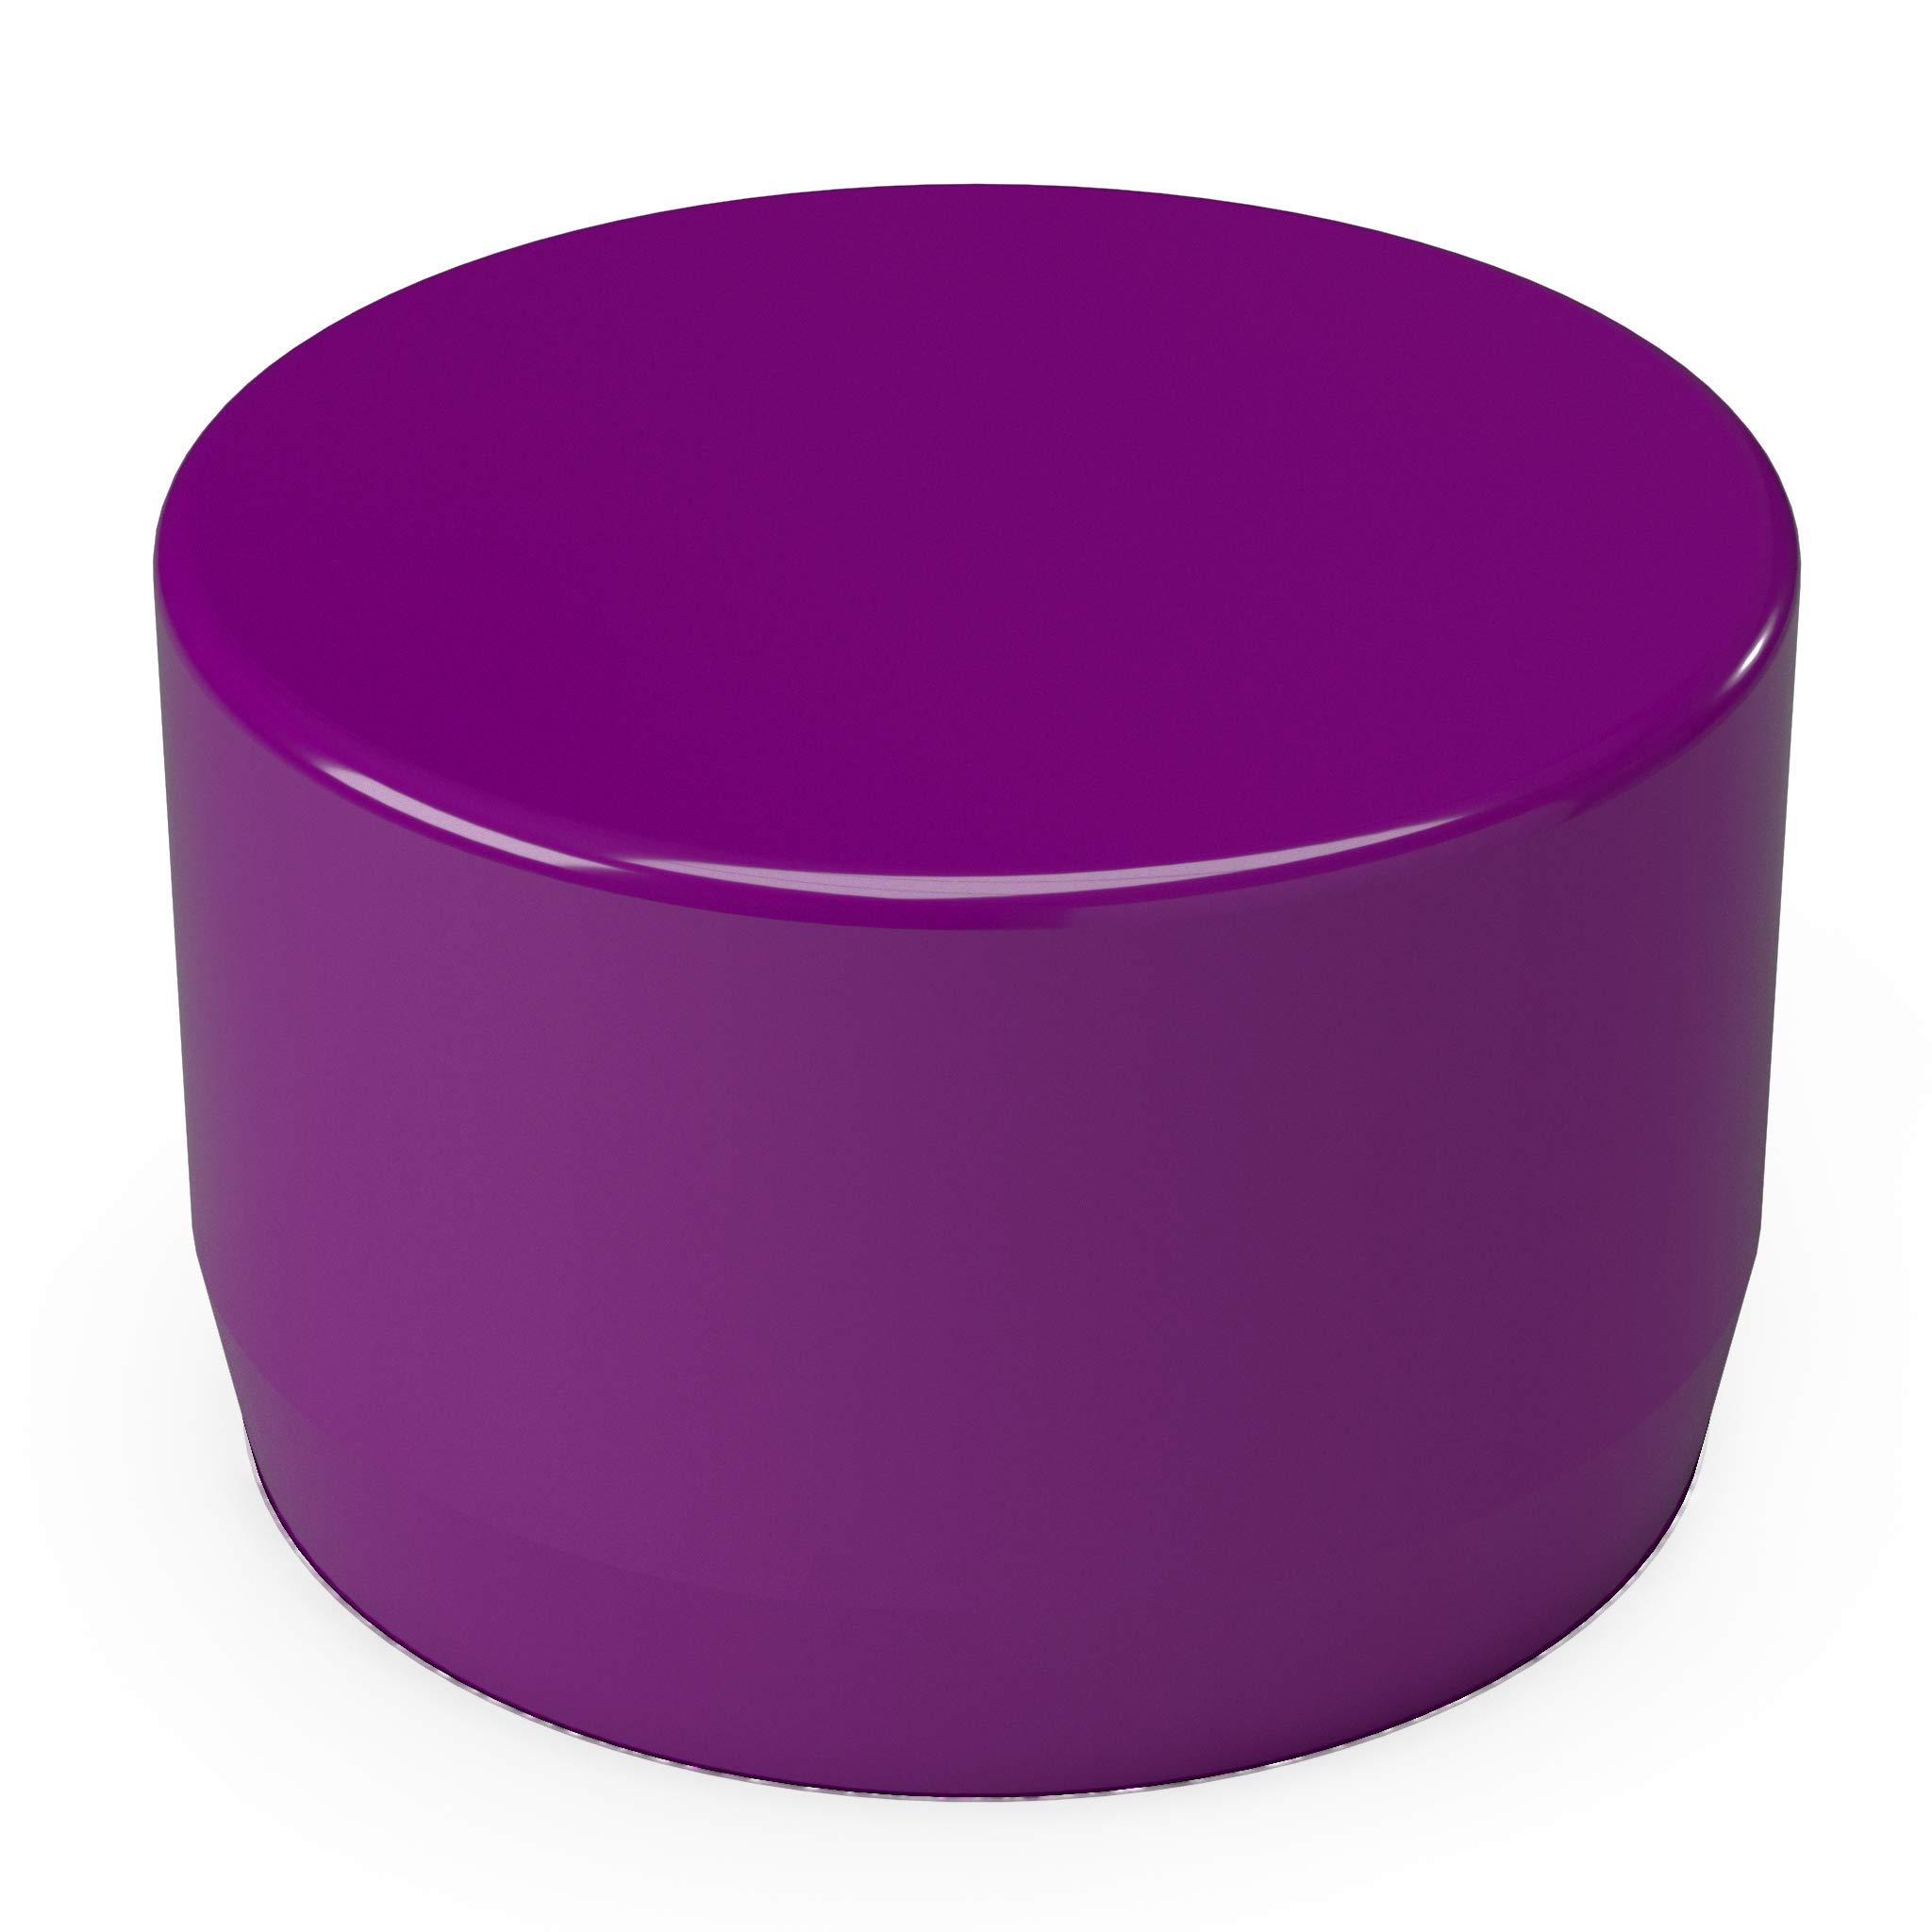 FORMUFIT F001EEC-PU-10 PVC External End Cap, Furniture Grade, 1'' Size, Purple (Pack of 10)